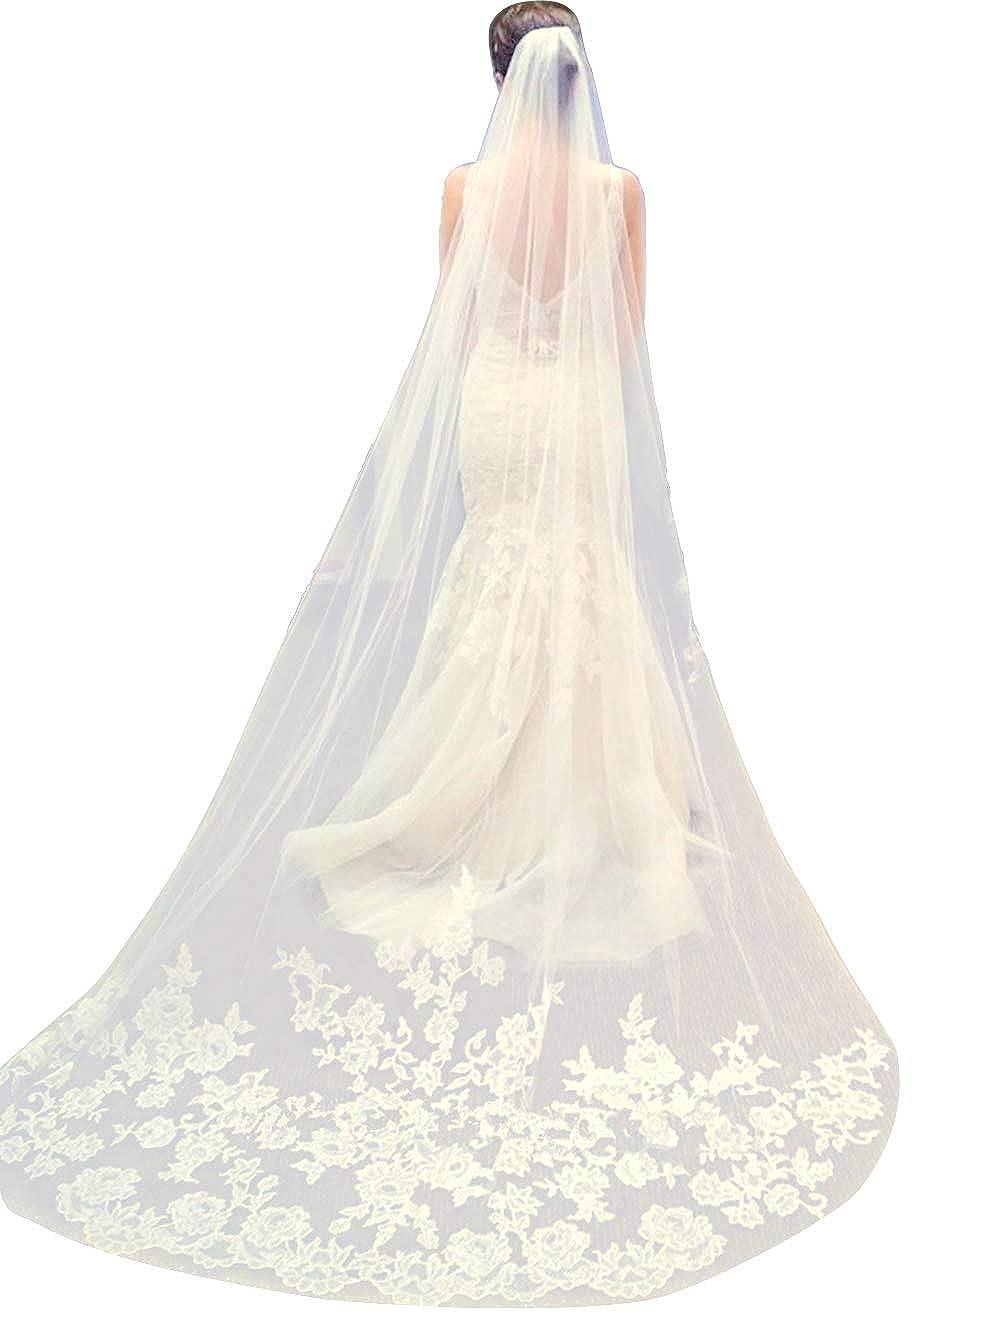 Qivange Wedding Veil White Ivory Cathedral Veil Lace Applique Edge Long Bridal Veil with Comb